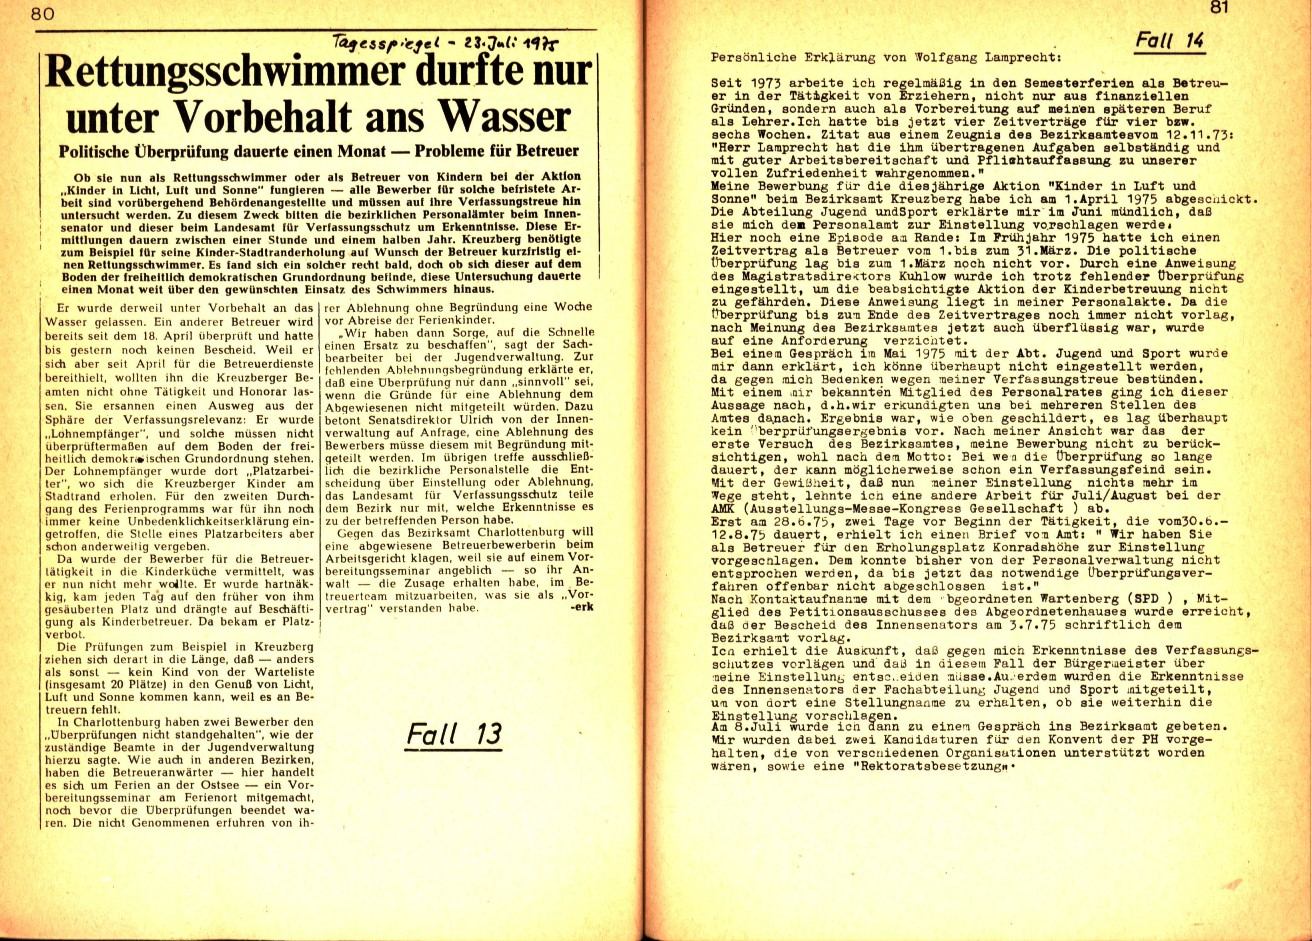 Berlin_VDS_Aktionskomitee_1975_BerufsverboteII_42